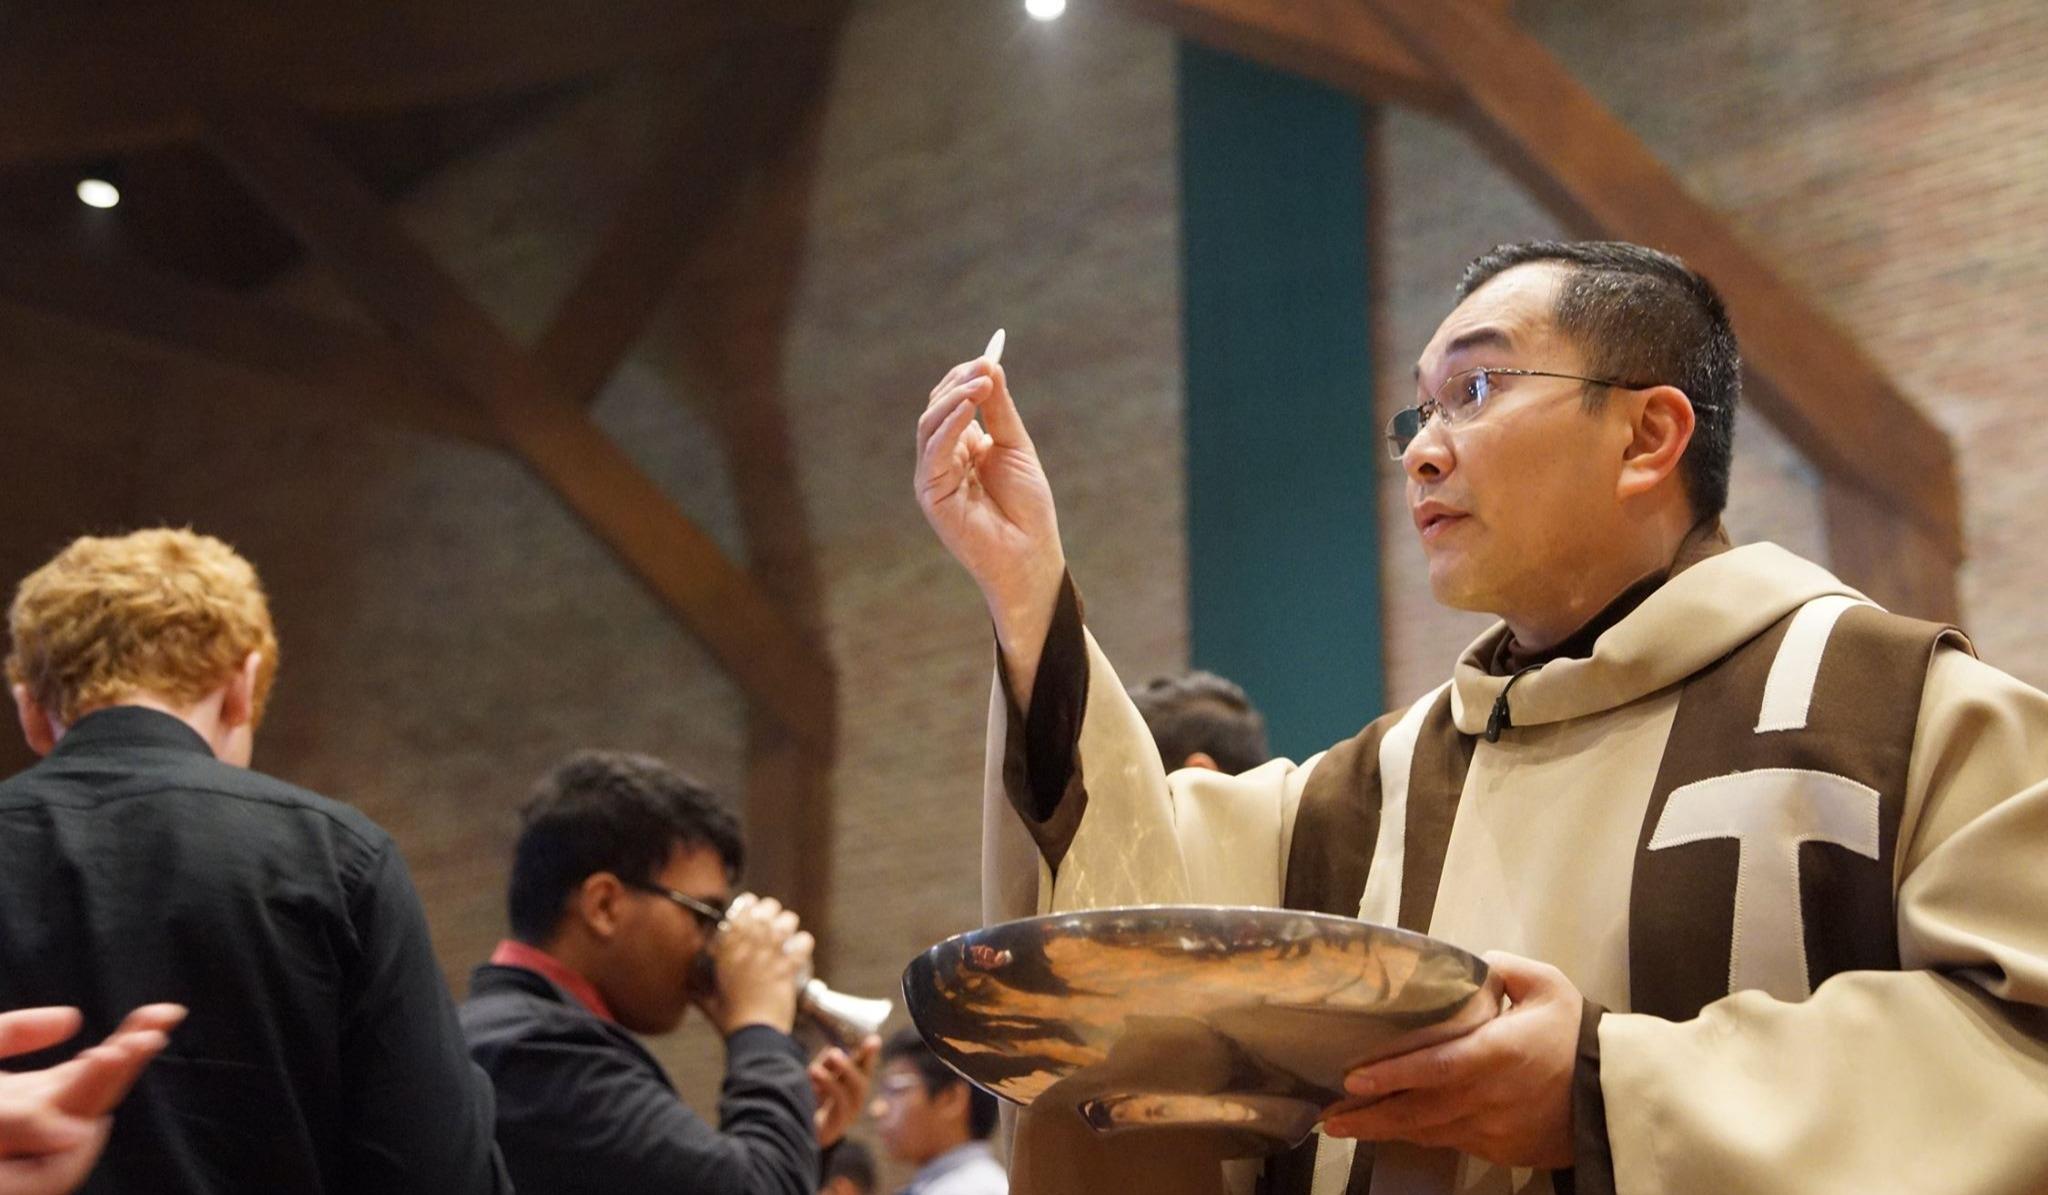 Fr. Zoy leading communion